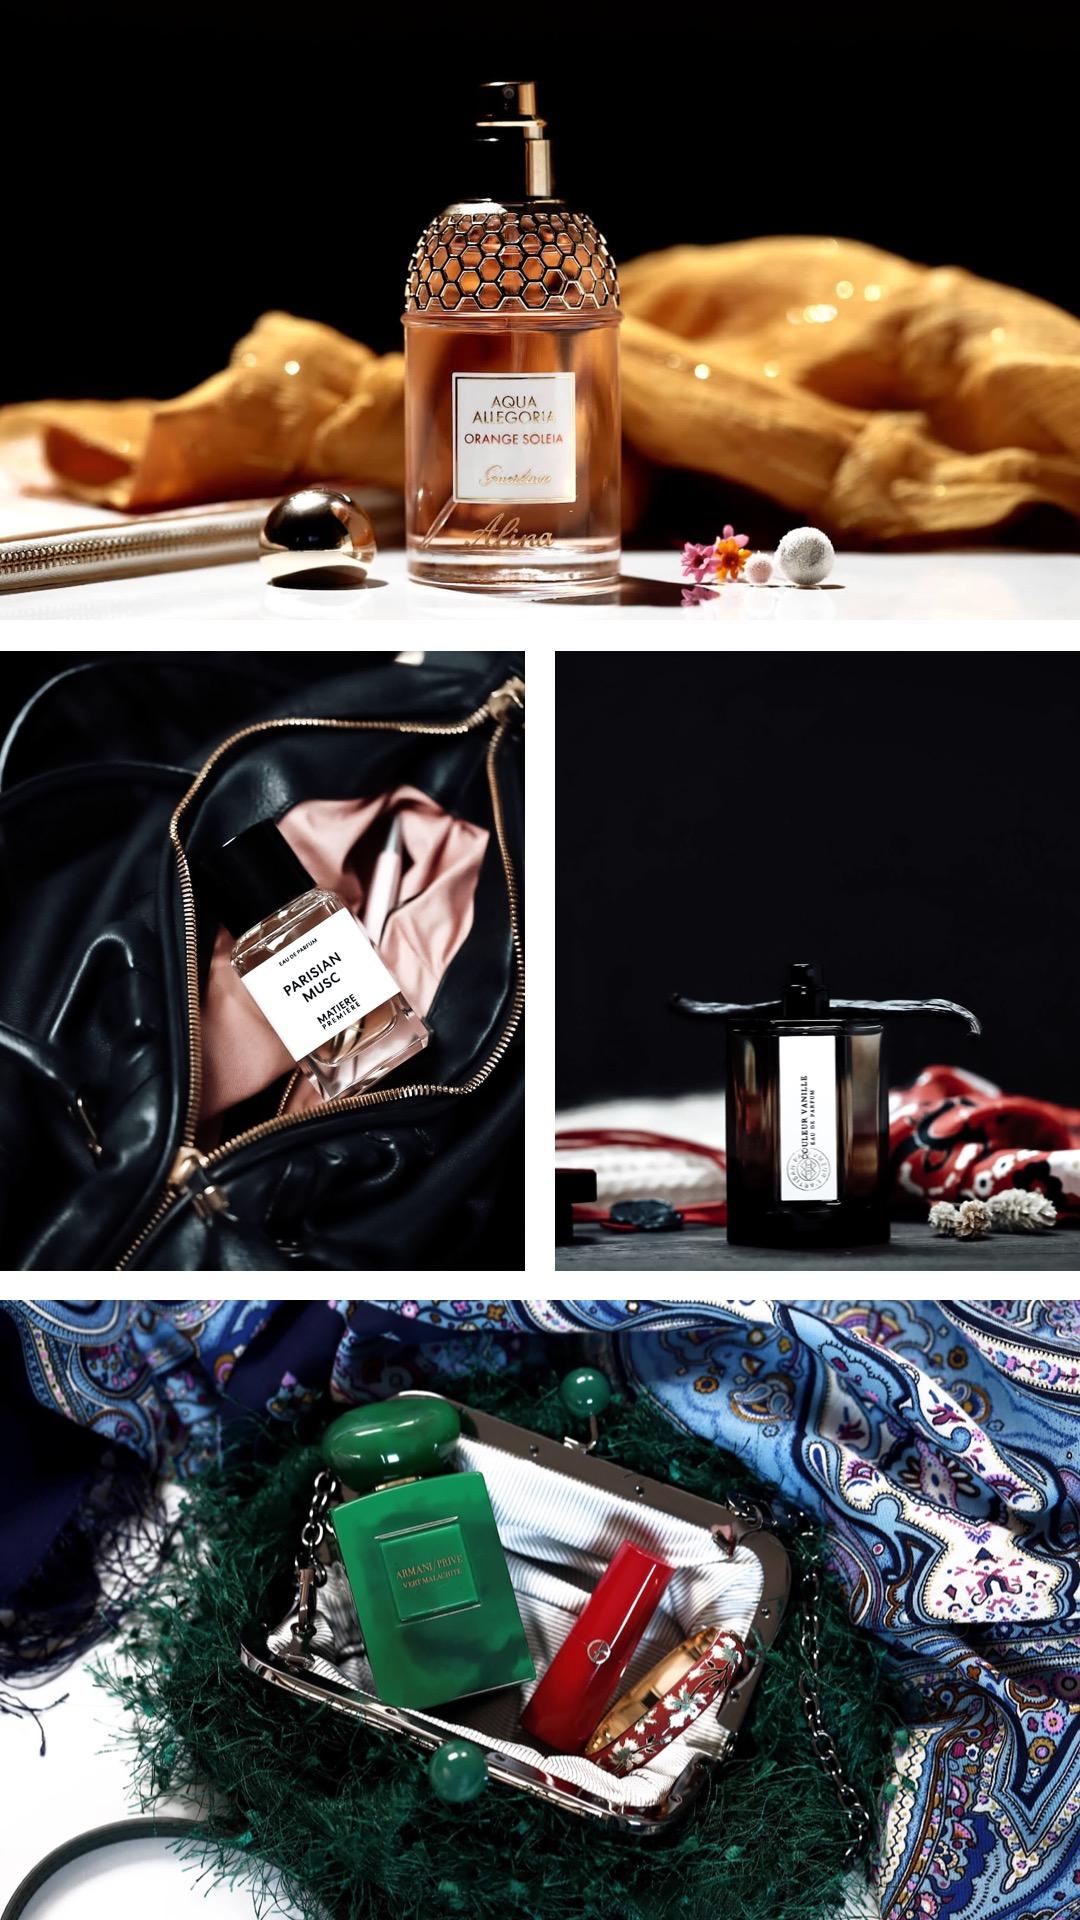 Meilleur Parfum 2020